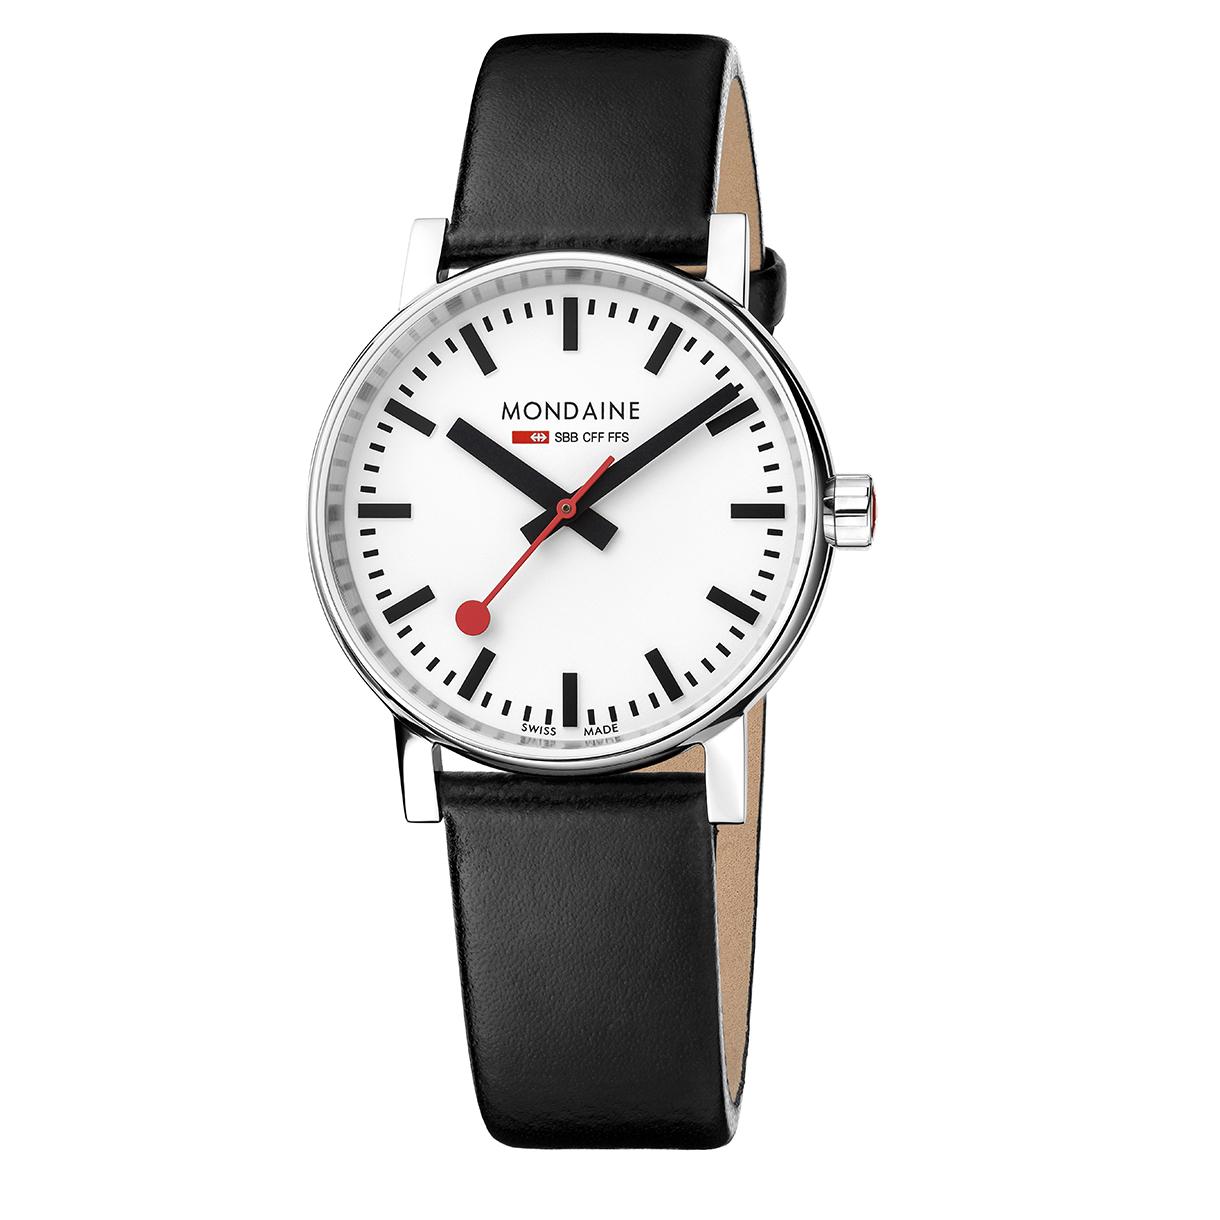 Mondaine evo2 35 mm mondaine watches clocks - Mondaine travel clock ...